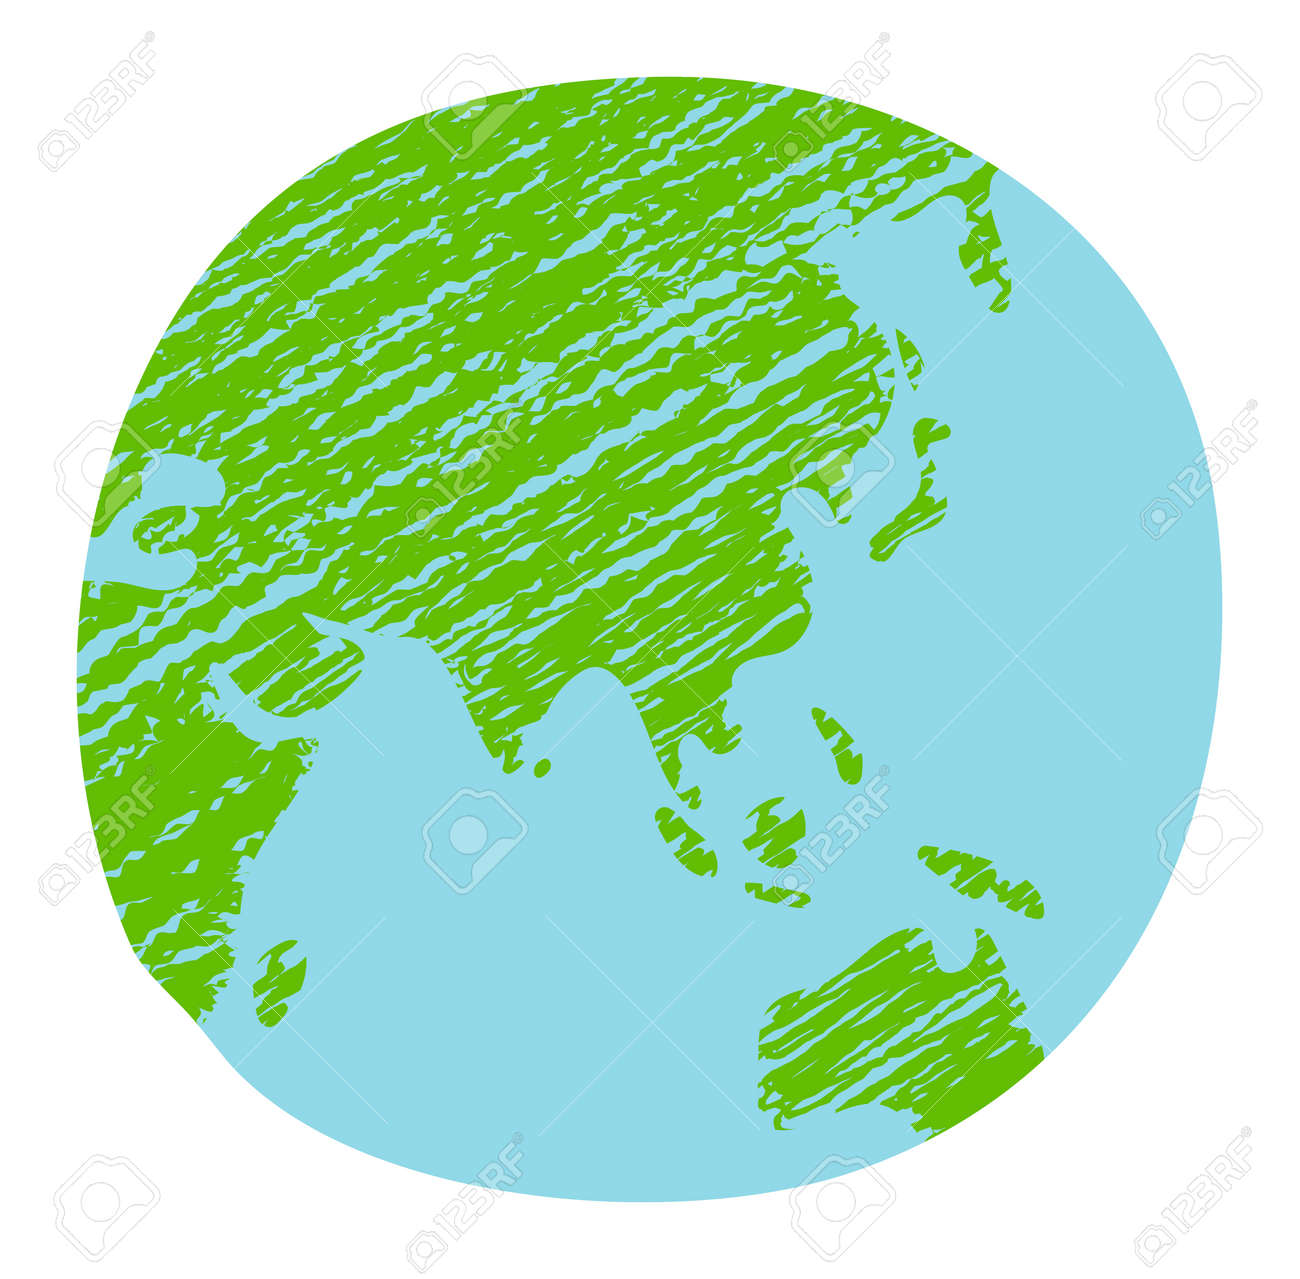 Chalked vector grunge earth (world map, globe) illustration - 169249621